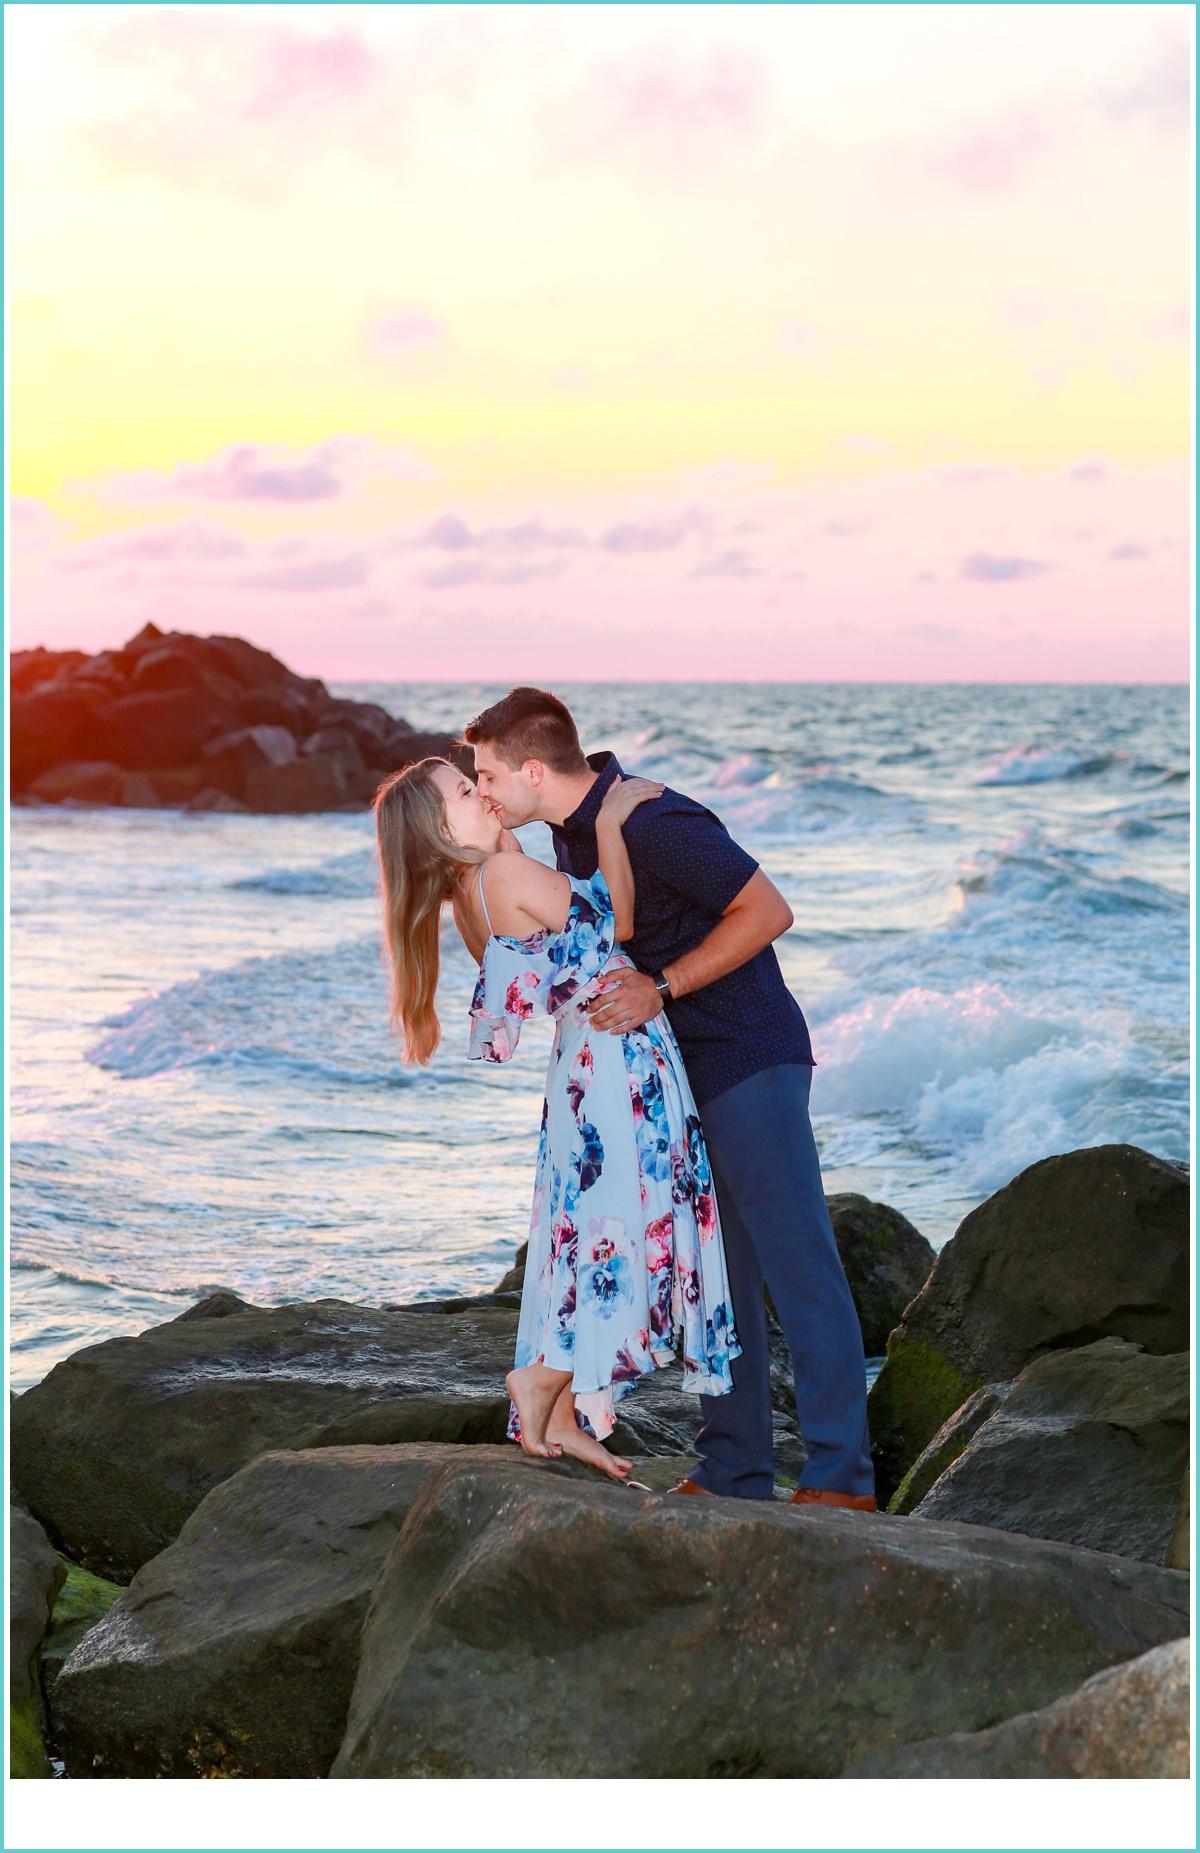 romantic sunset kiss